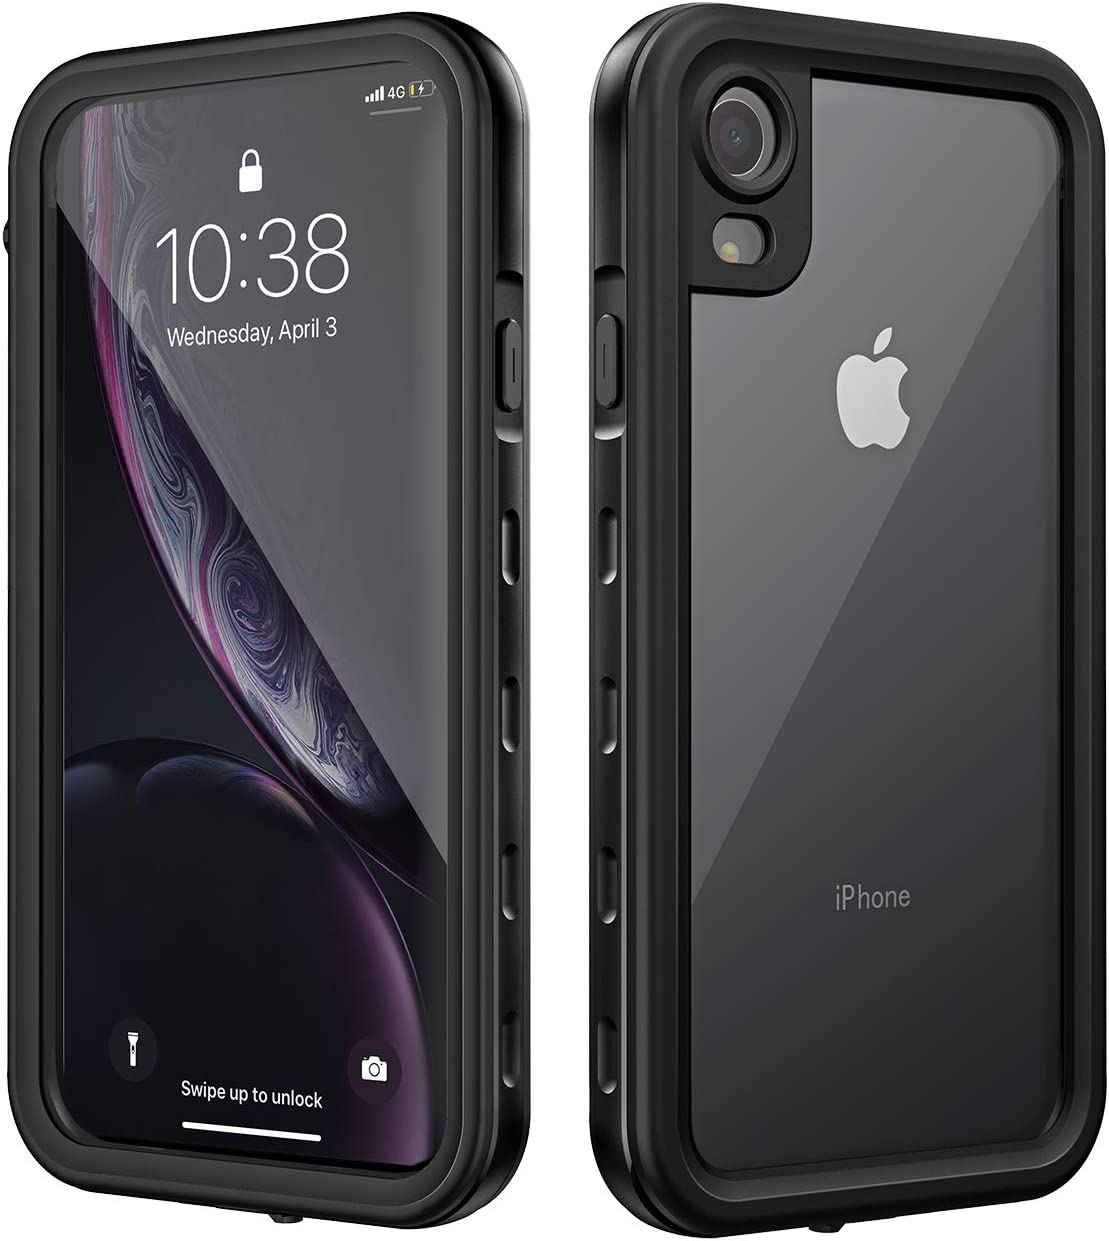 Mpow iPhone XR Waterproof Case, Underwater Full Sealed Cover Snowproof Shockproof Dirtproof Sandproof Ip68 Certified Built-in Screen Protector Waterproof Case Compatible with iPhone Xr(Black)